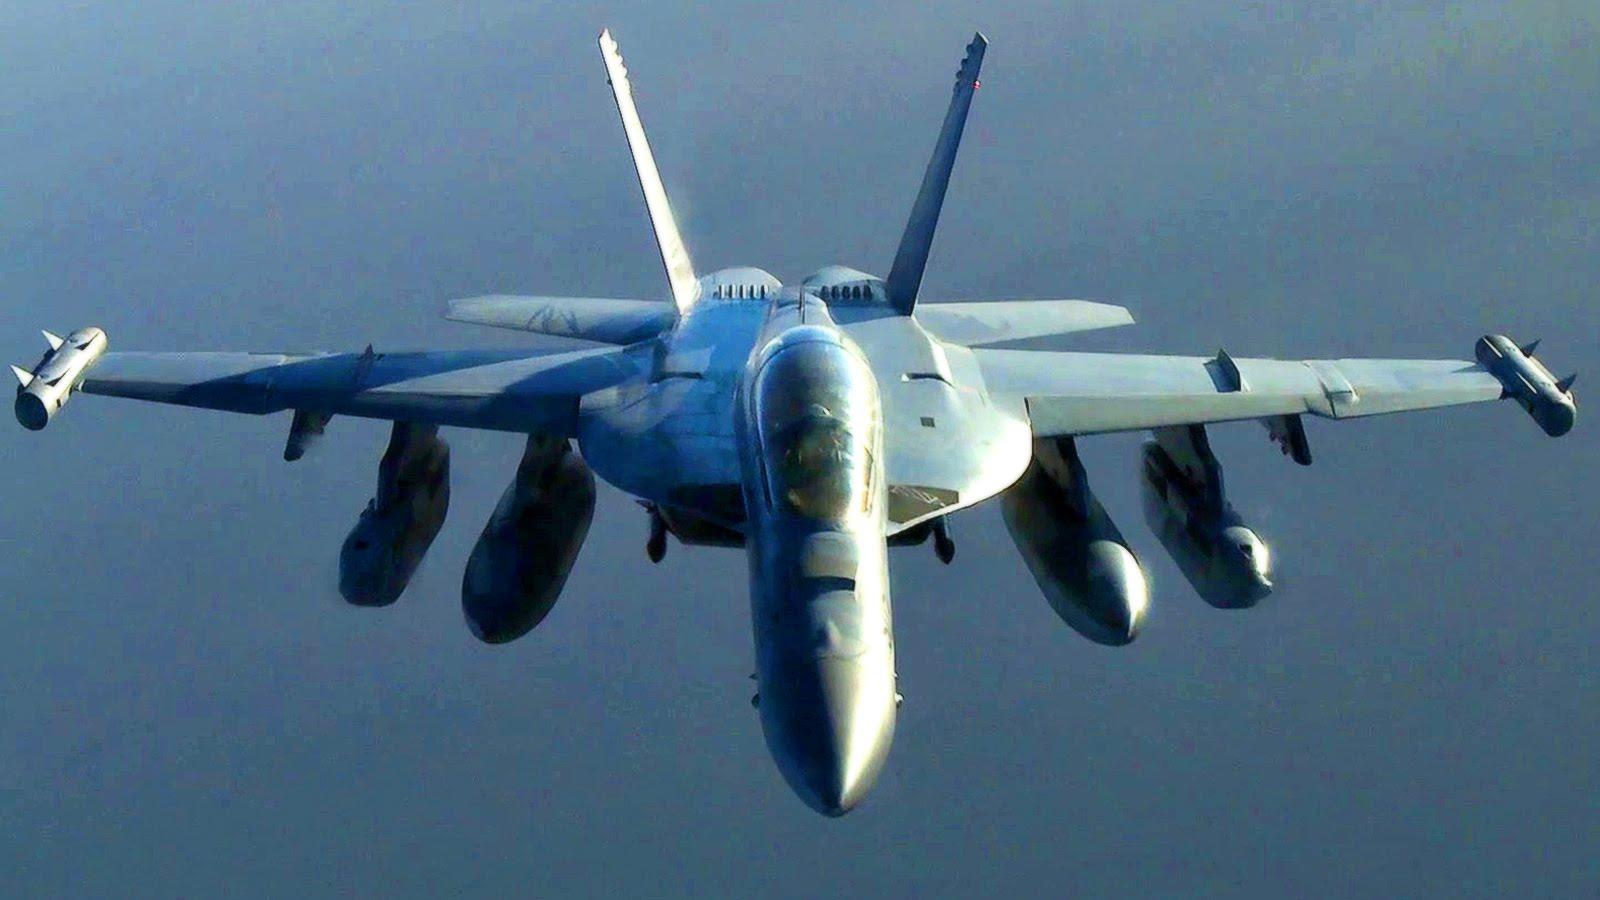 U.S. Navy EA-18G Growler – KC-135 Refueling Mission